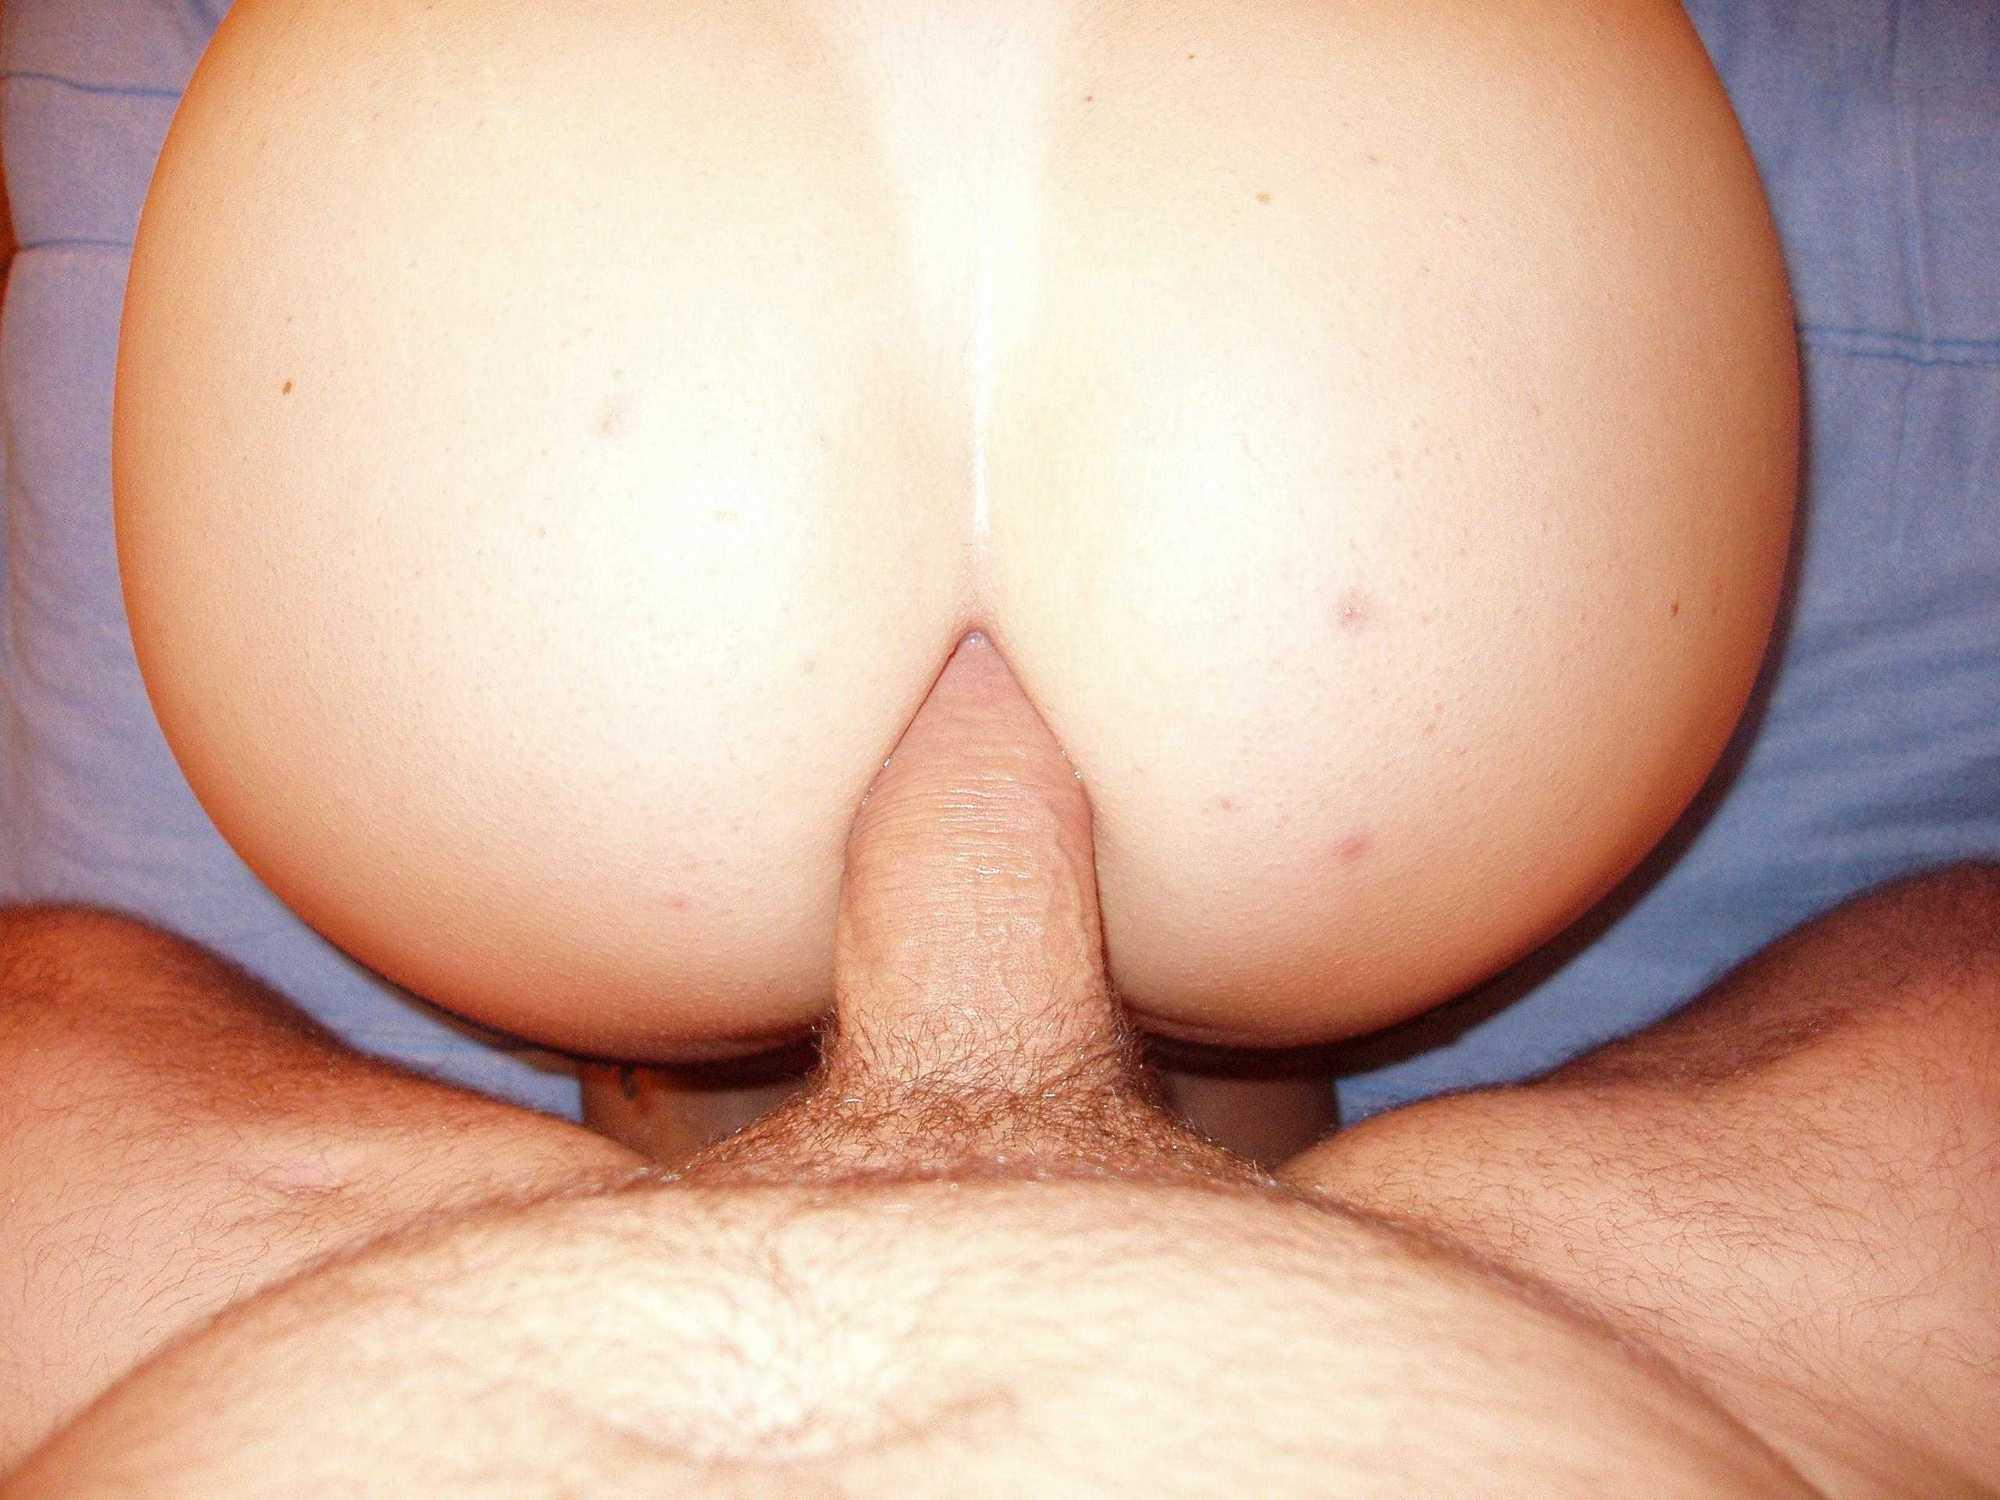 Вертихвостка целует пенис любовника в домашних условиях